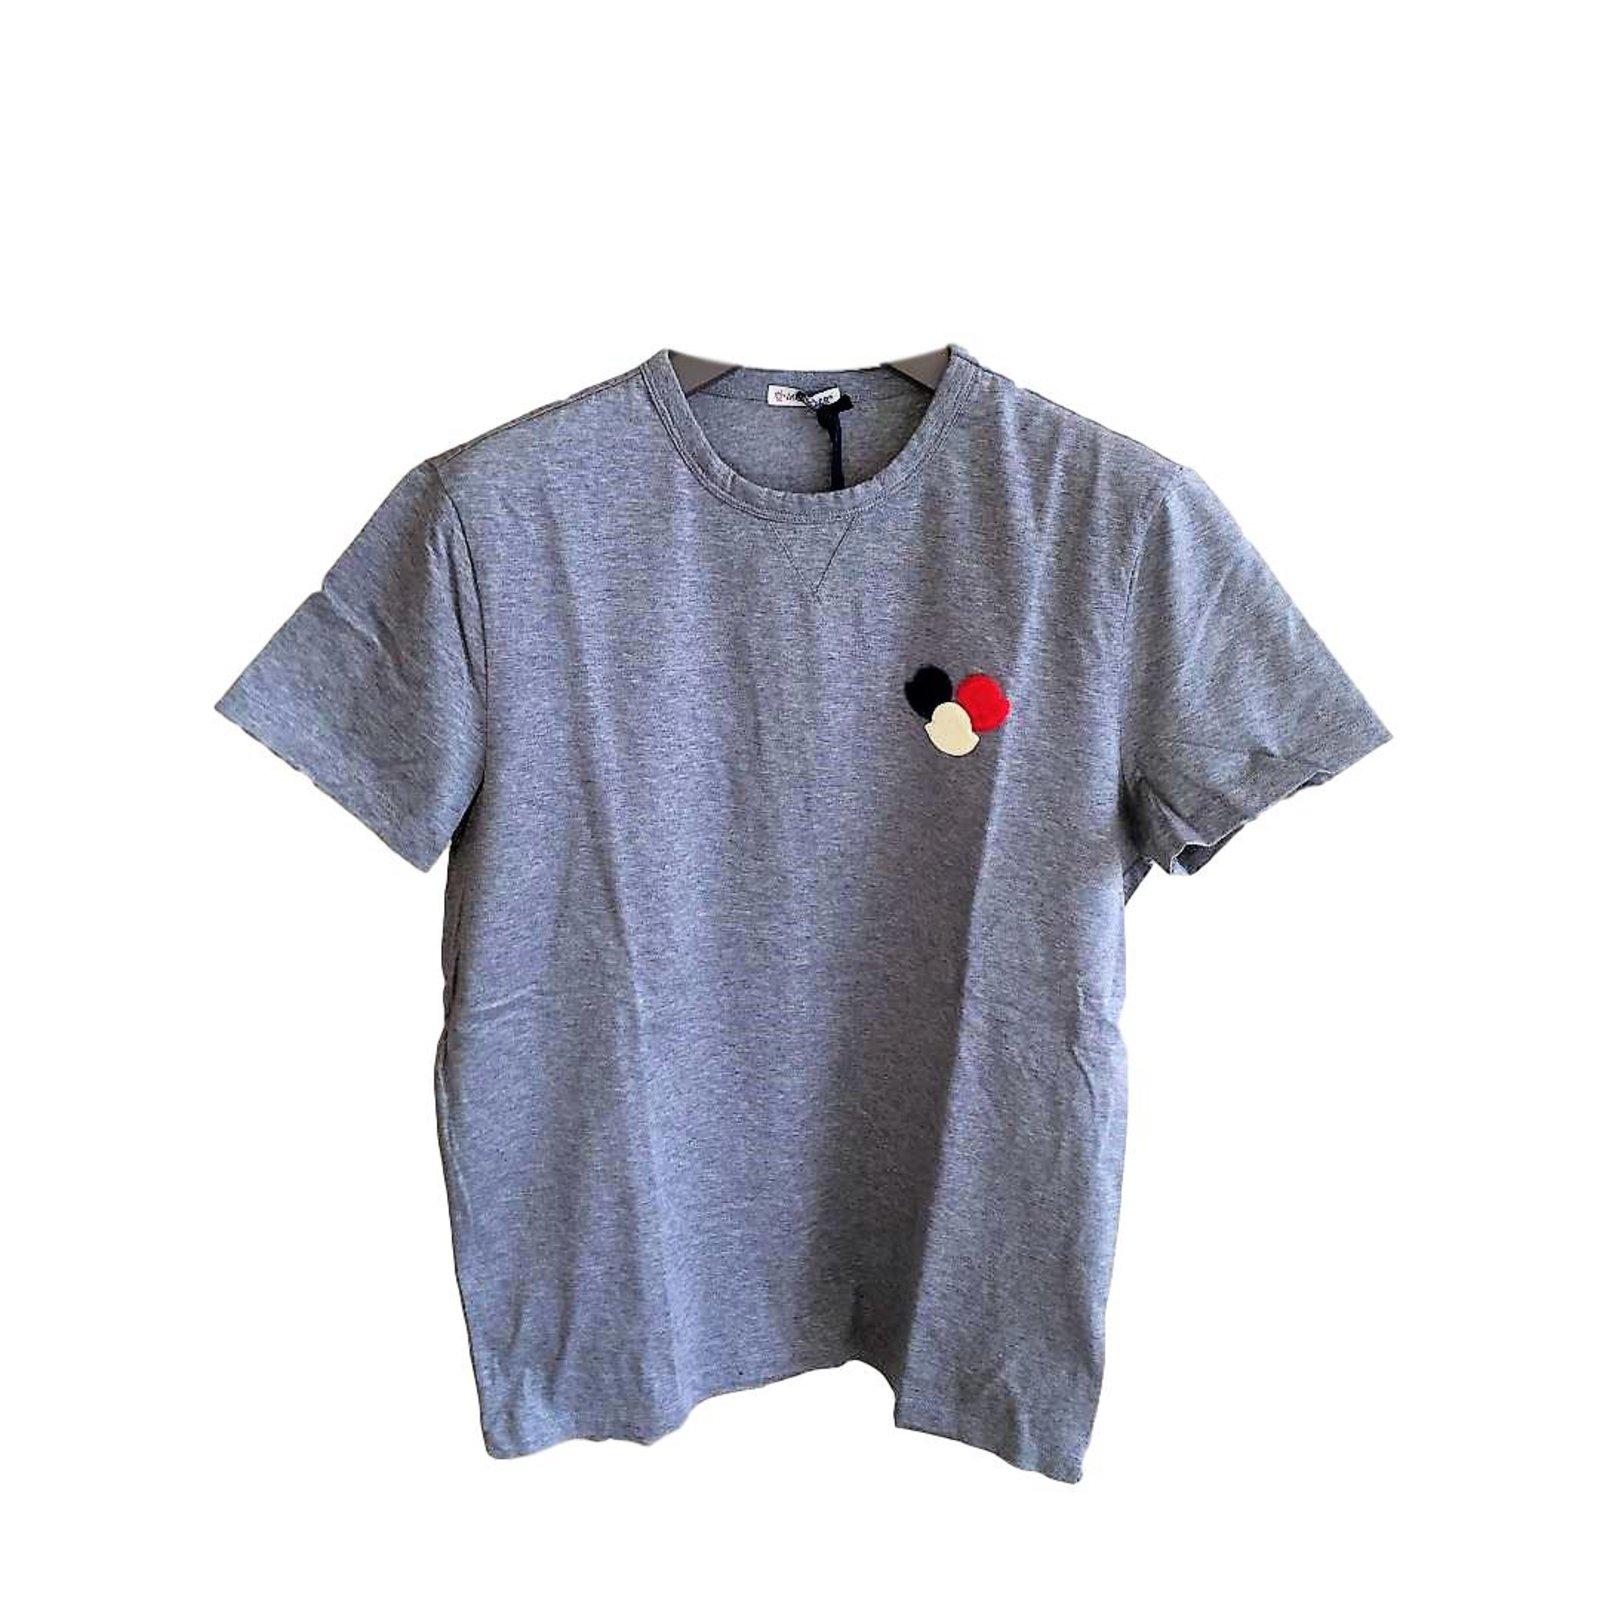 Moncler Moncler basic men's t-shirt Tees Cotton Grey ref.63018